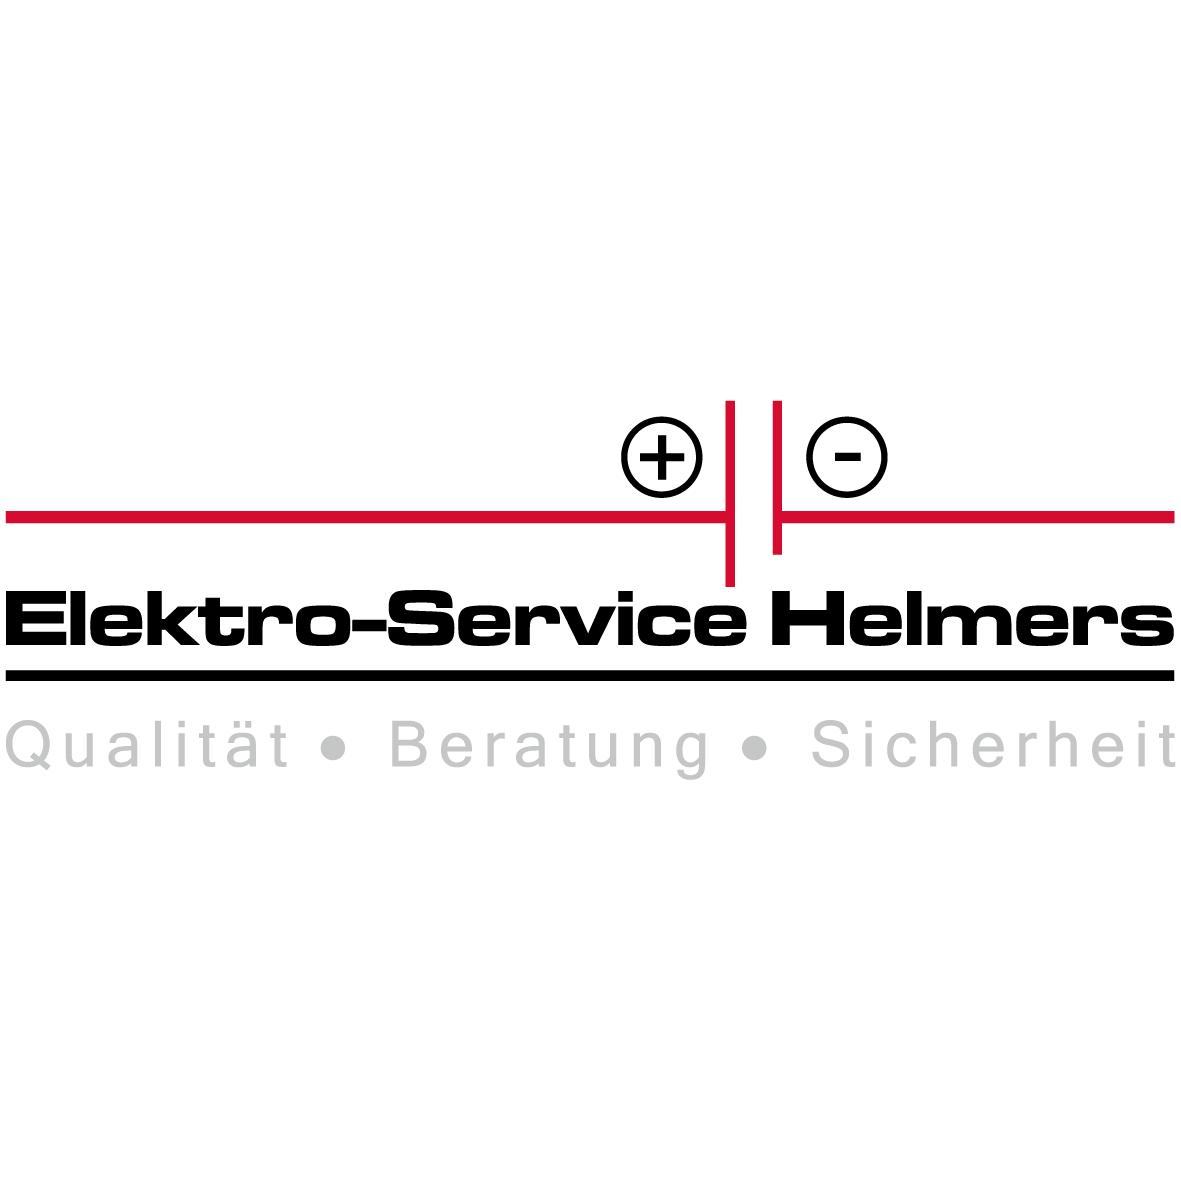 Elektro-Service Helmers Varel